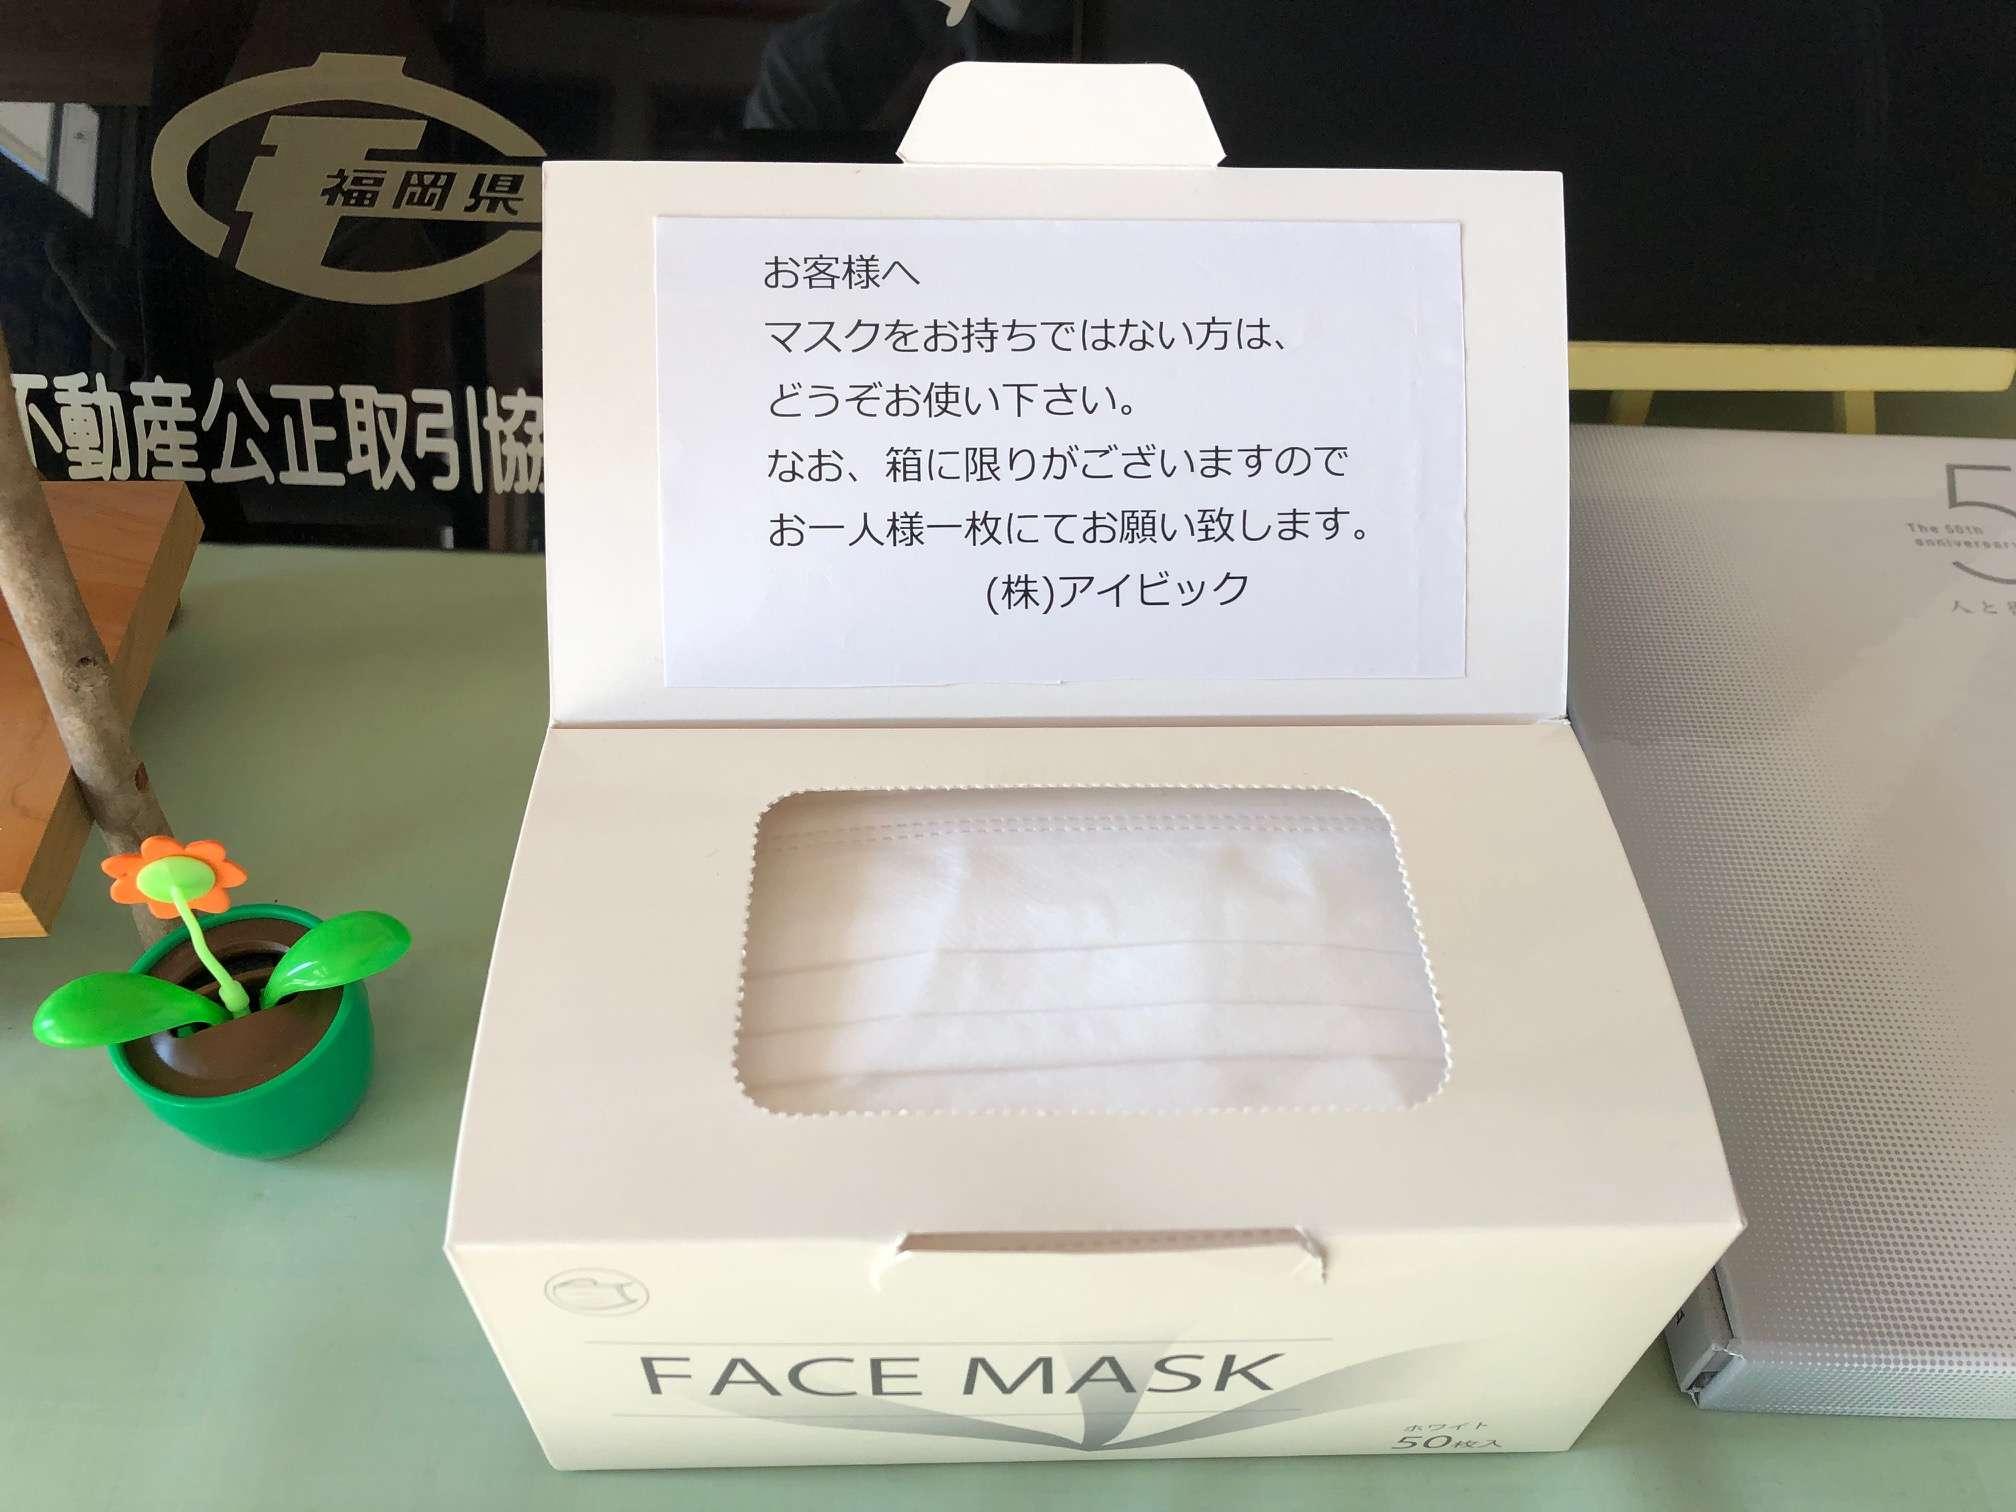 image 福岡支店のコロナ対策